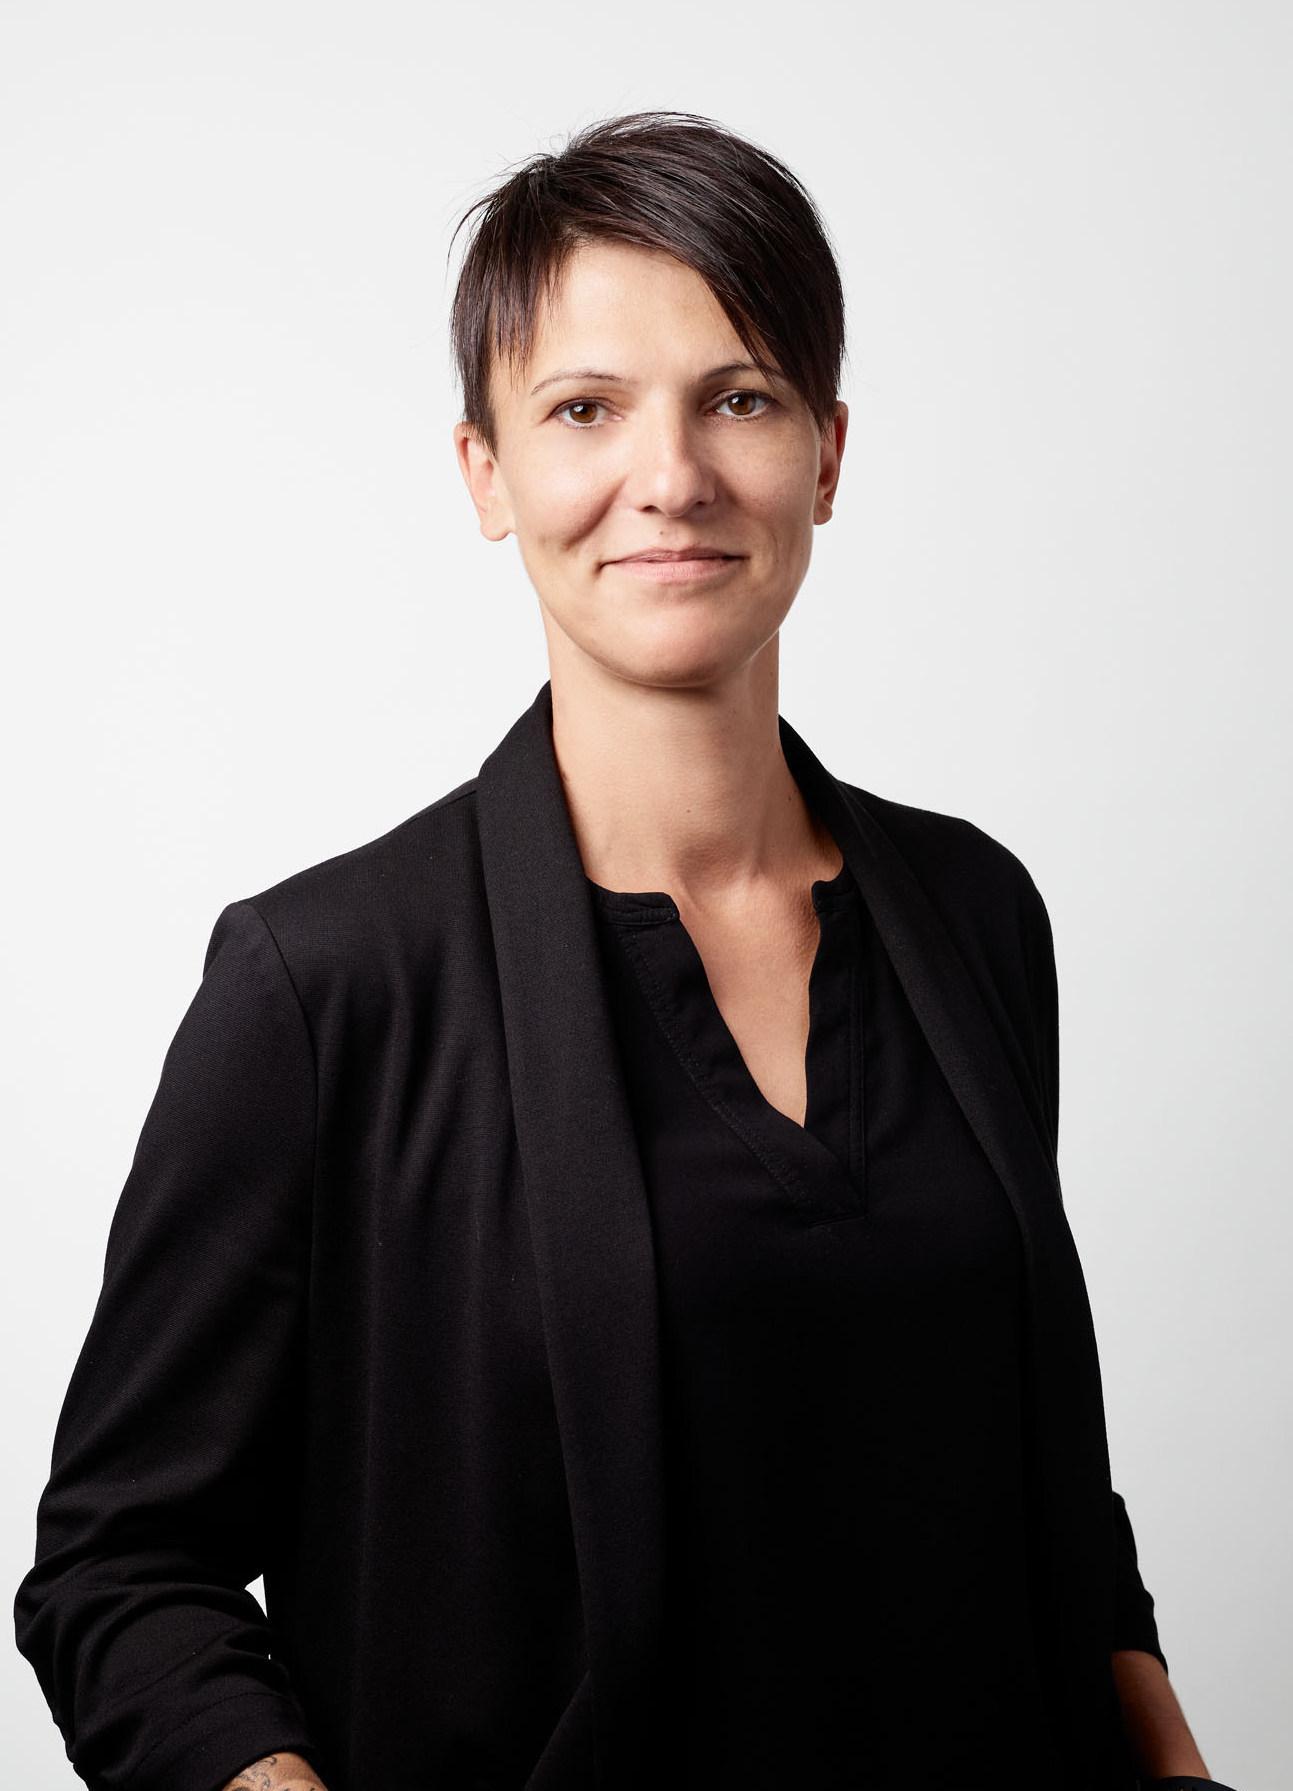 Silvia Feichtinger